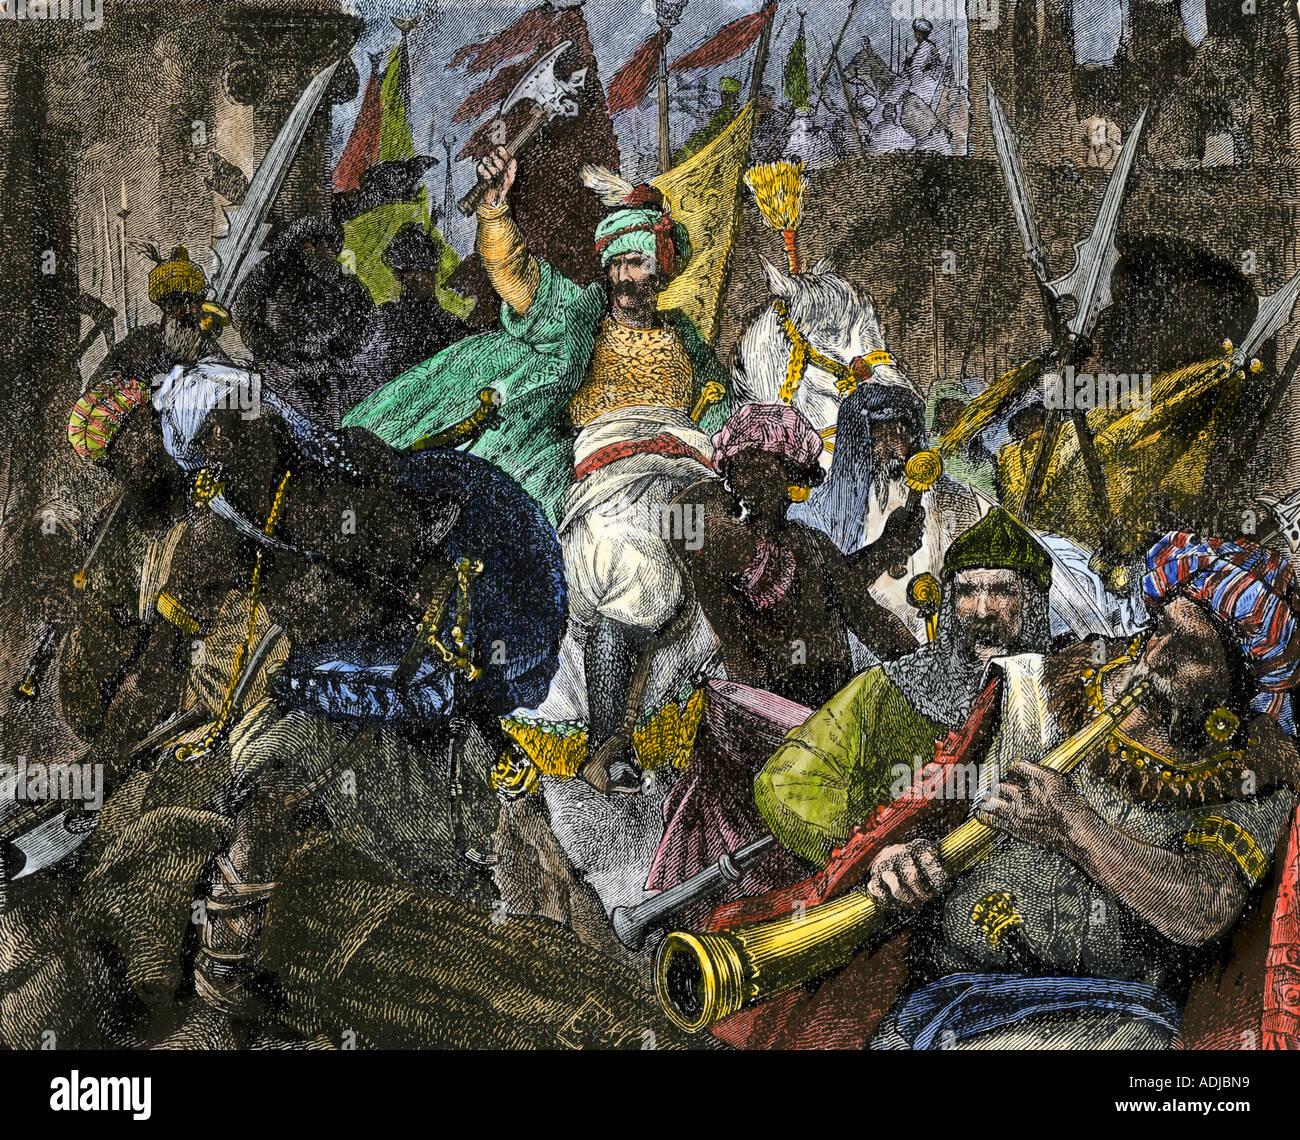 turks entering constantinople it the ottoman